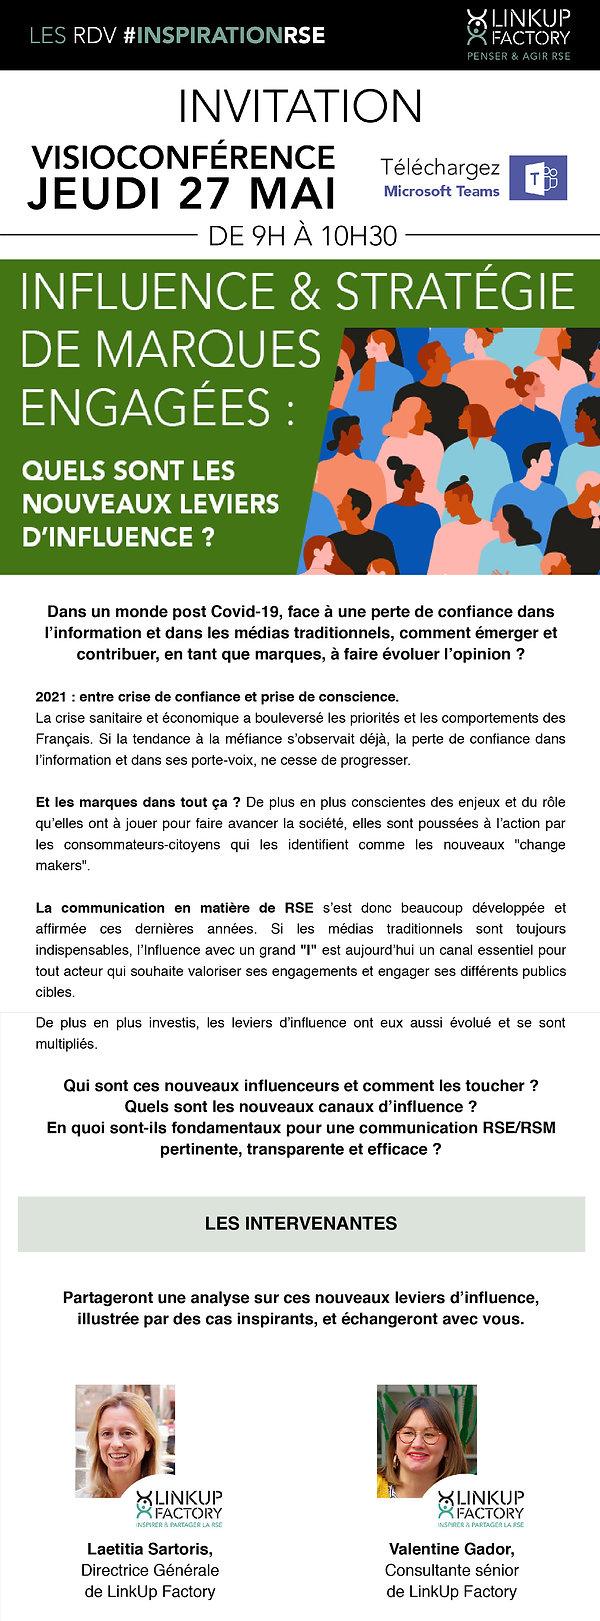 INFLUENCE-01.jpg